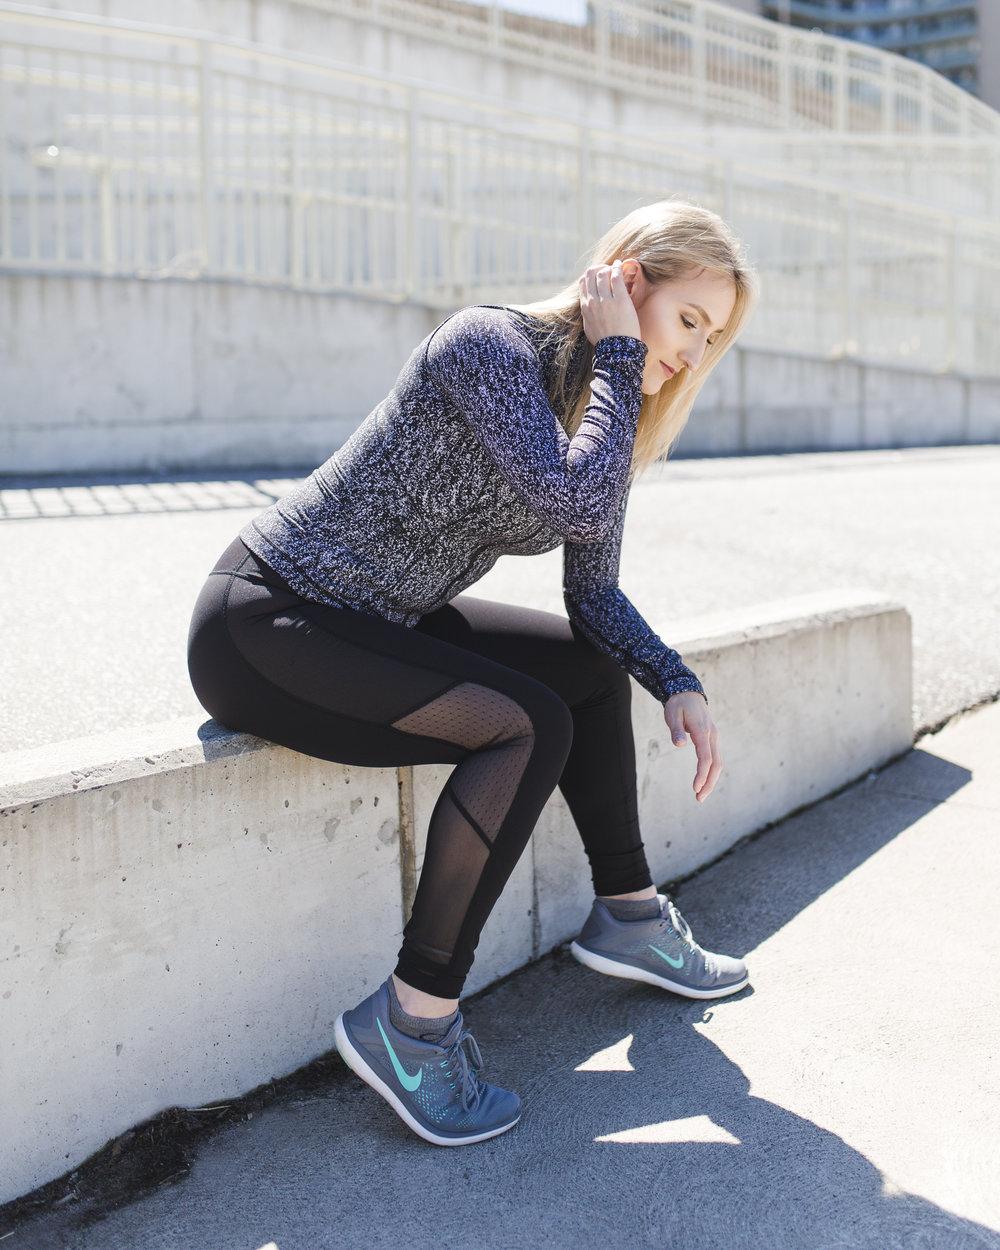 Oksana Fitspo (18 of 24).jpg